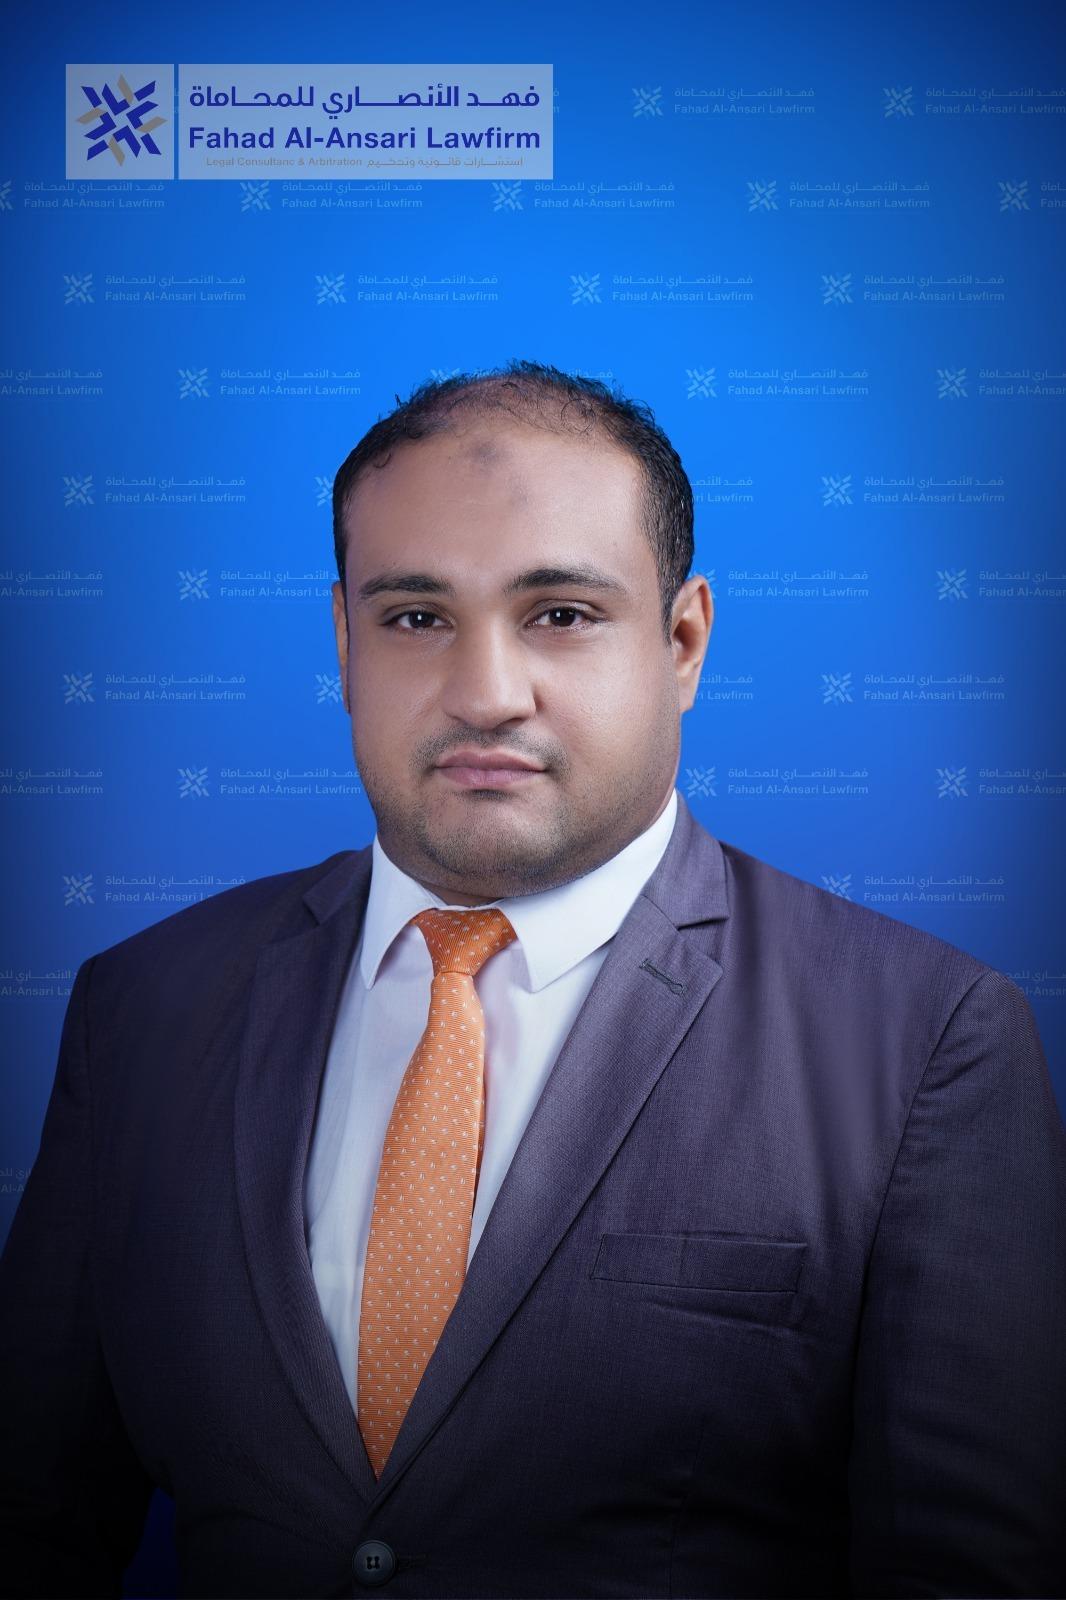 Ahmed Ibrahim Al-Dali